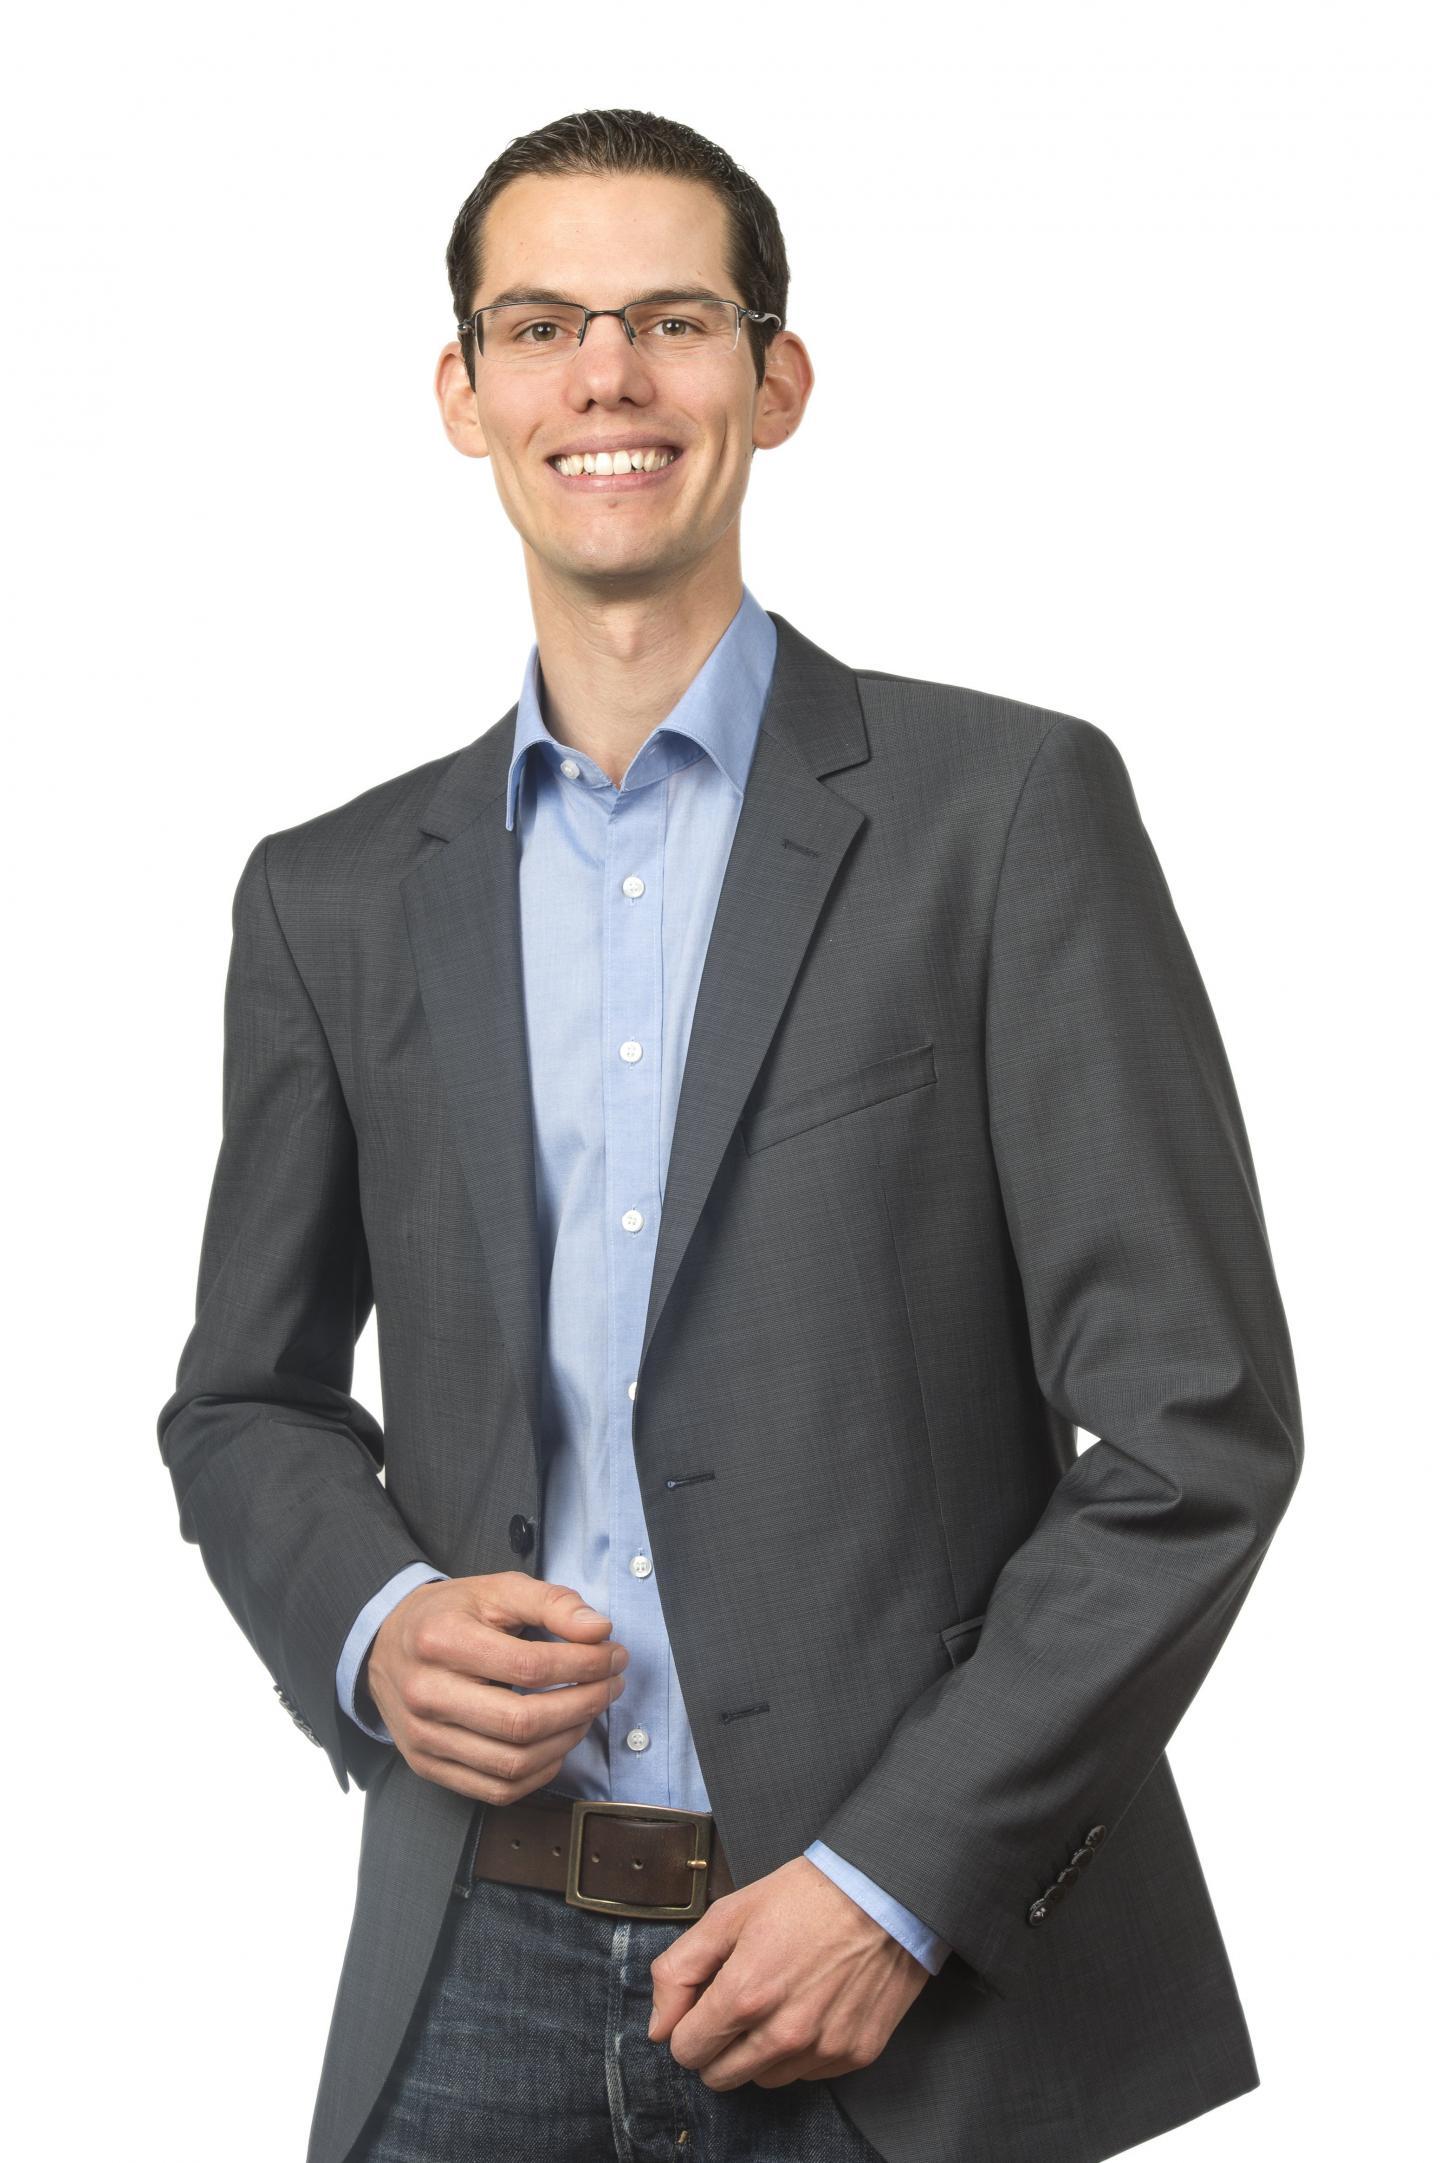 Christian Rossow, Saarland University